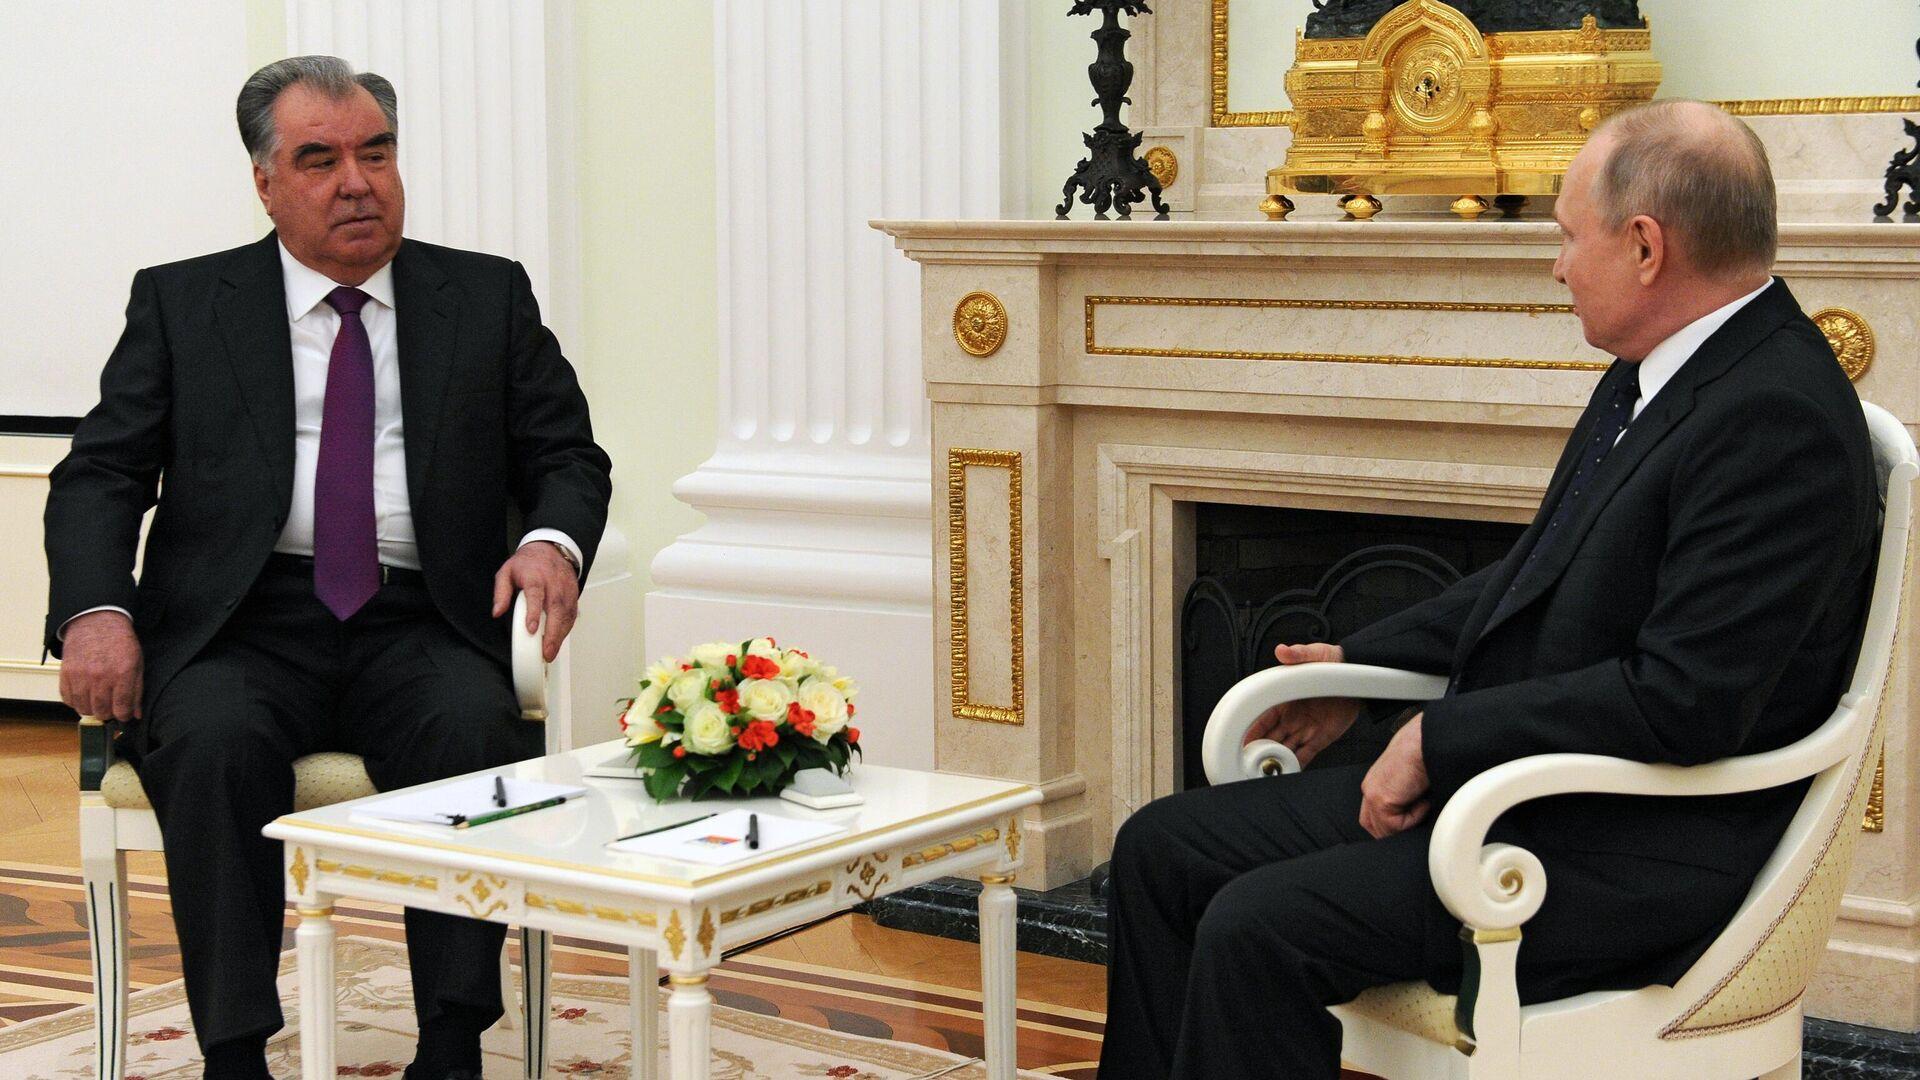 Президент РФ Владимир Путин и президент Таджикистана Эмомали Рахмон во время встречи. - РИА Новости, 1920, 08.05.2021